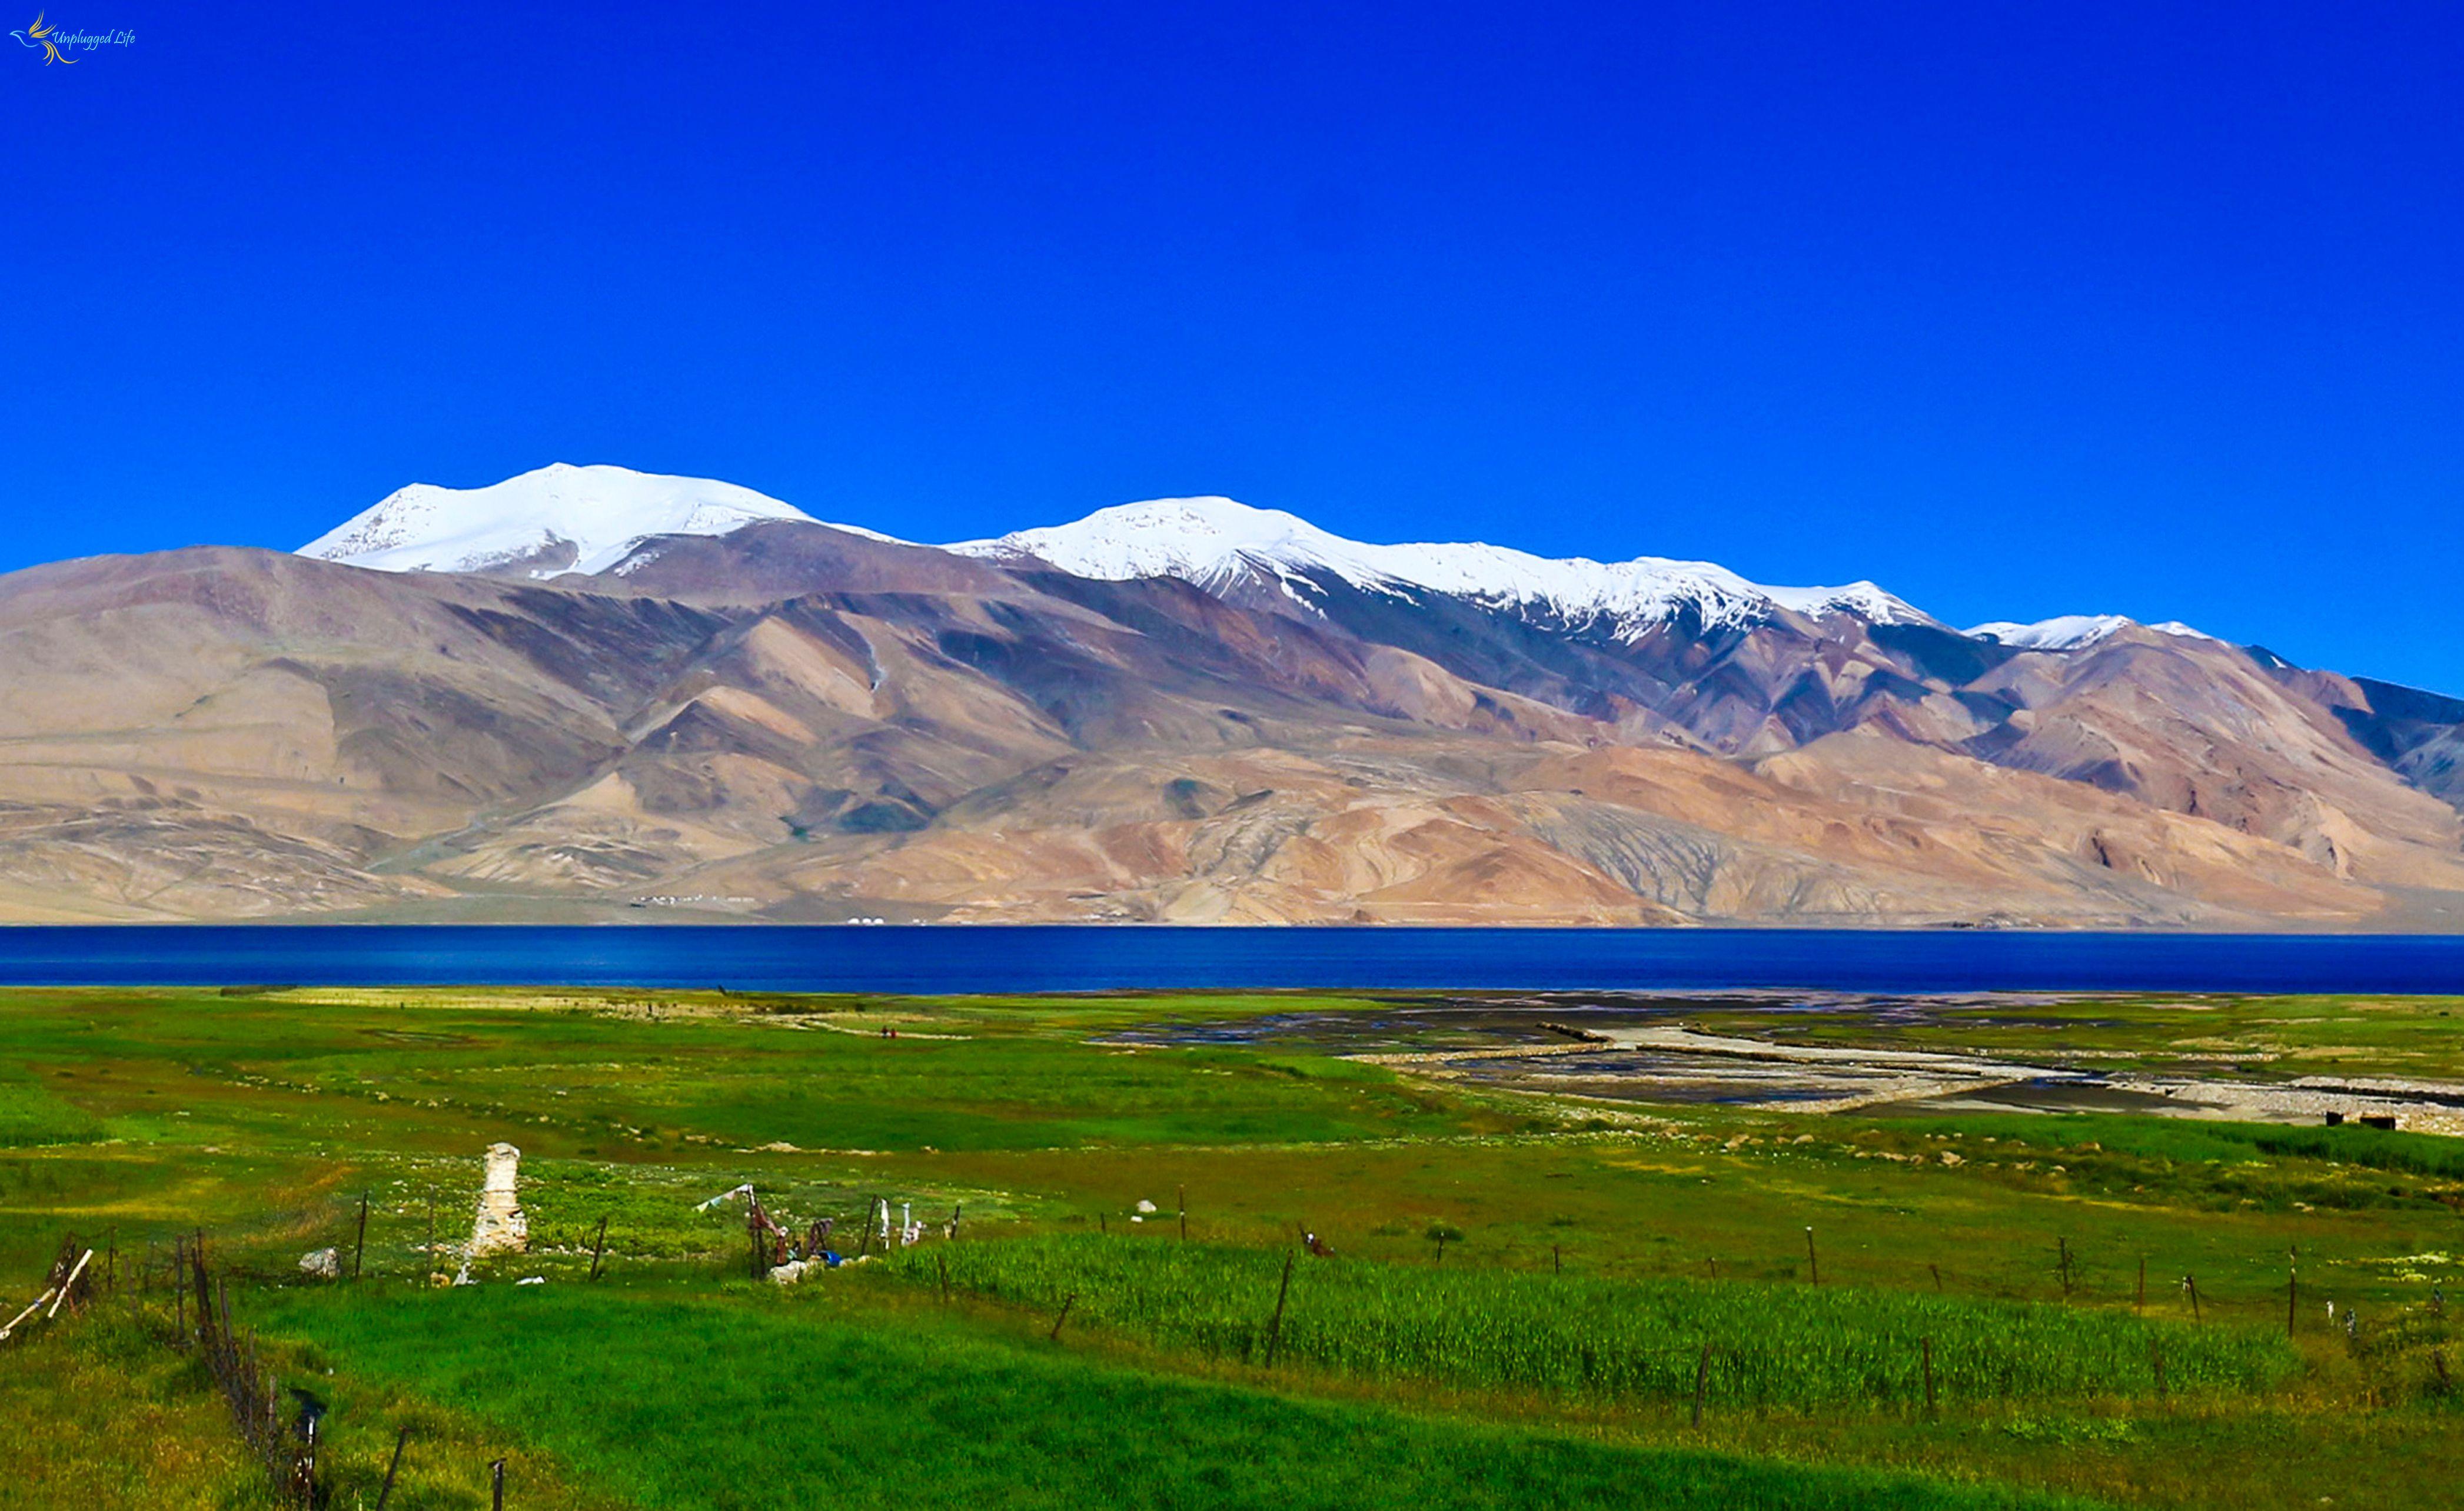 Tso Moriri - Best places to visit in Ladakh